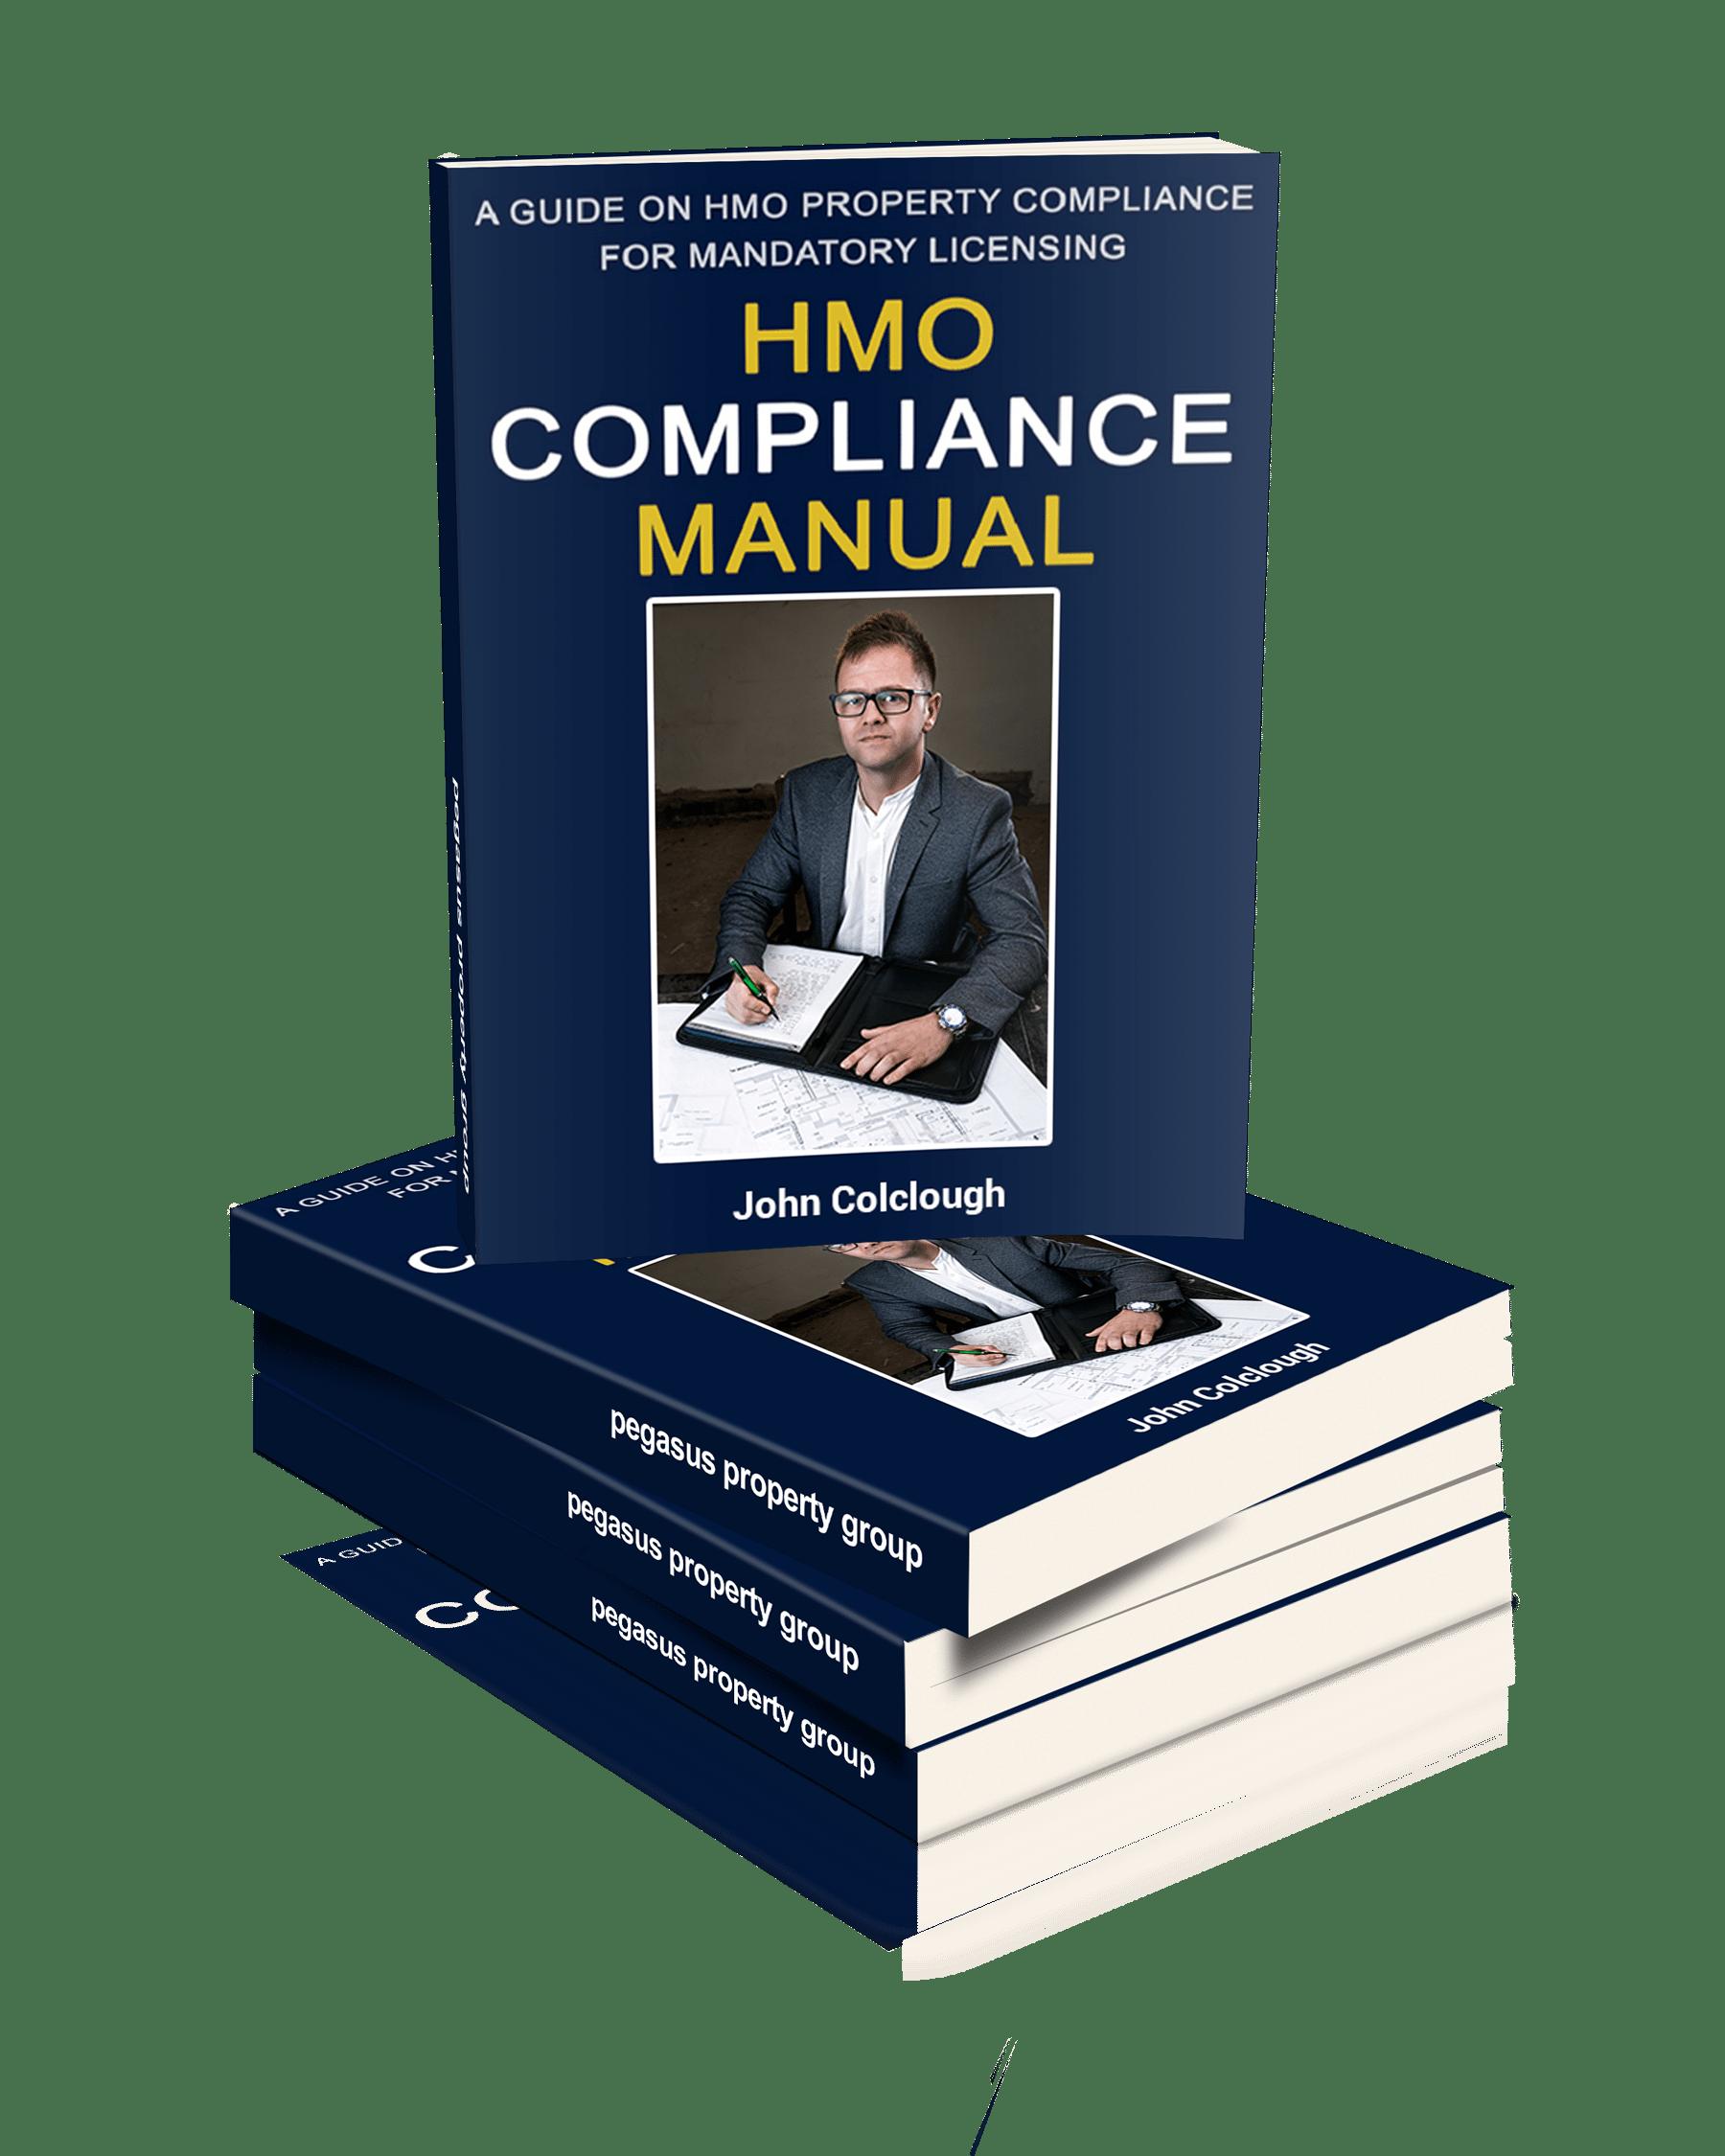 hmo compliance